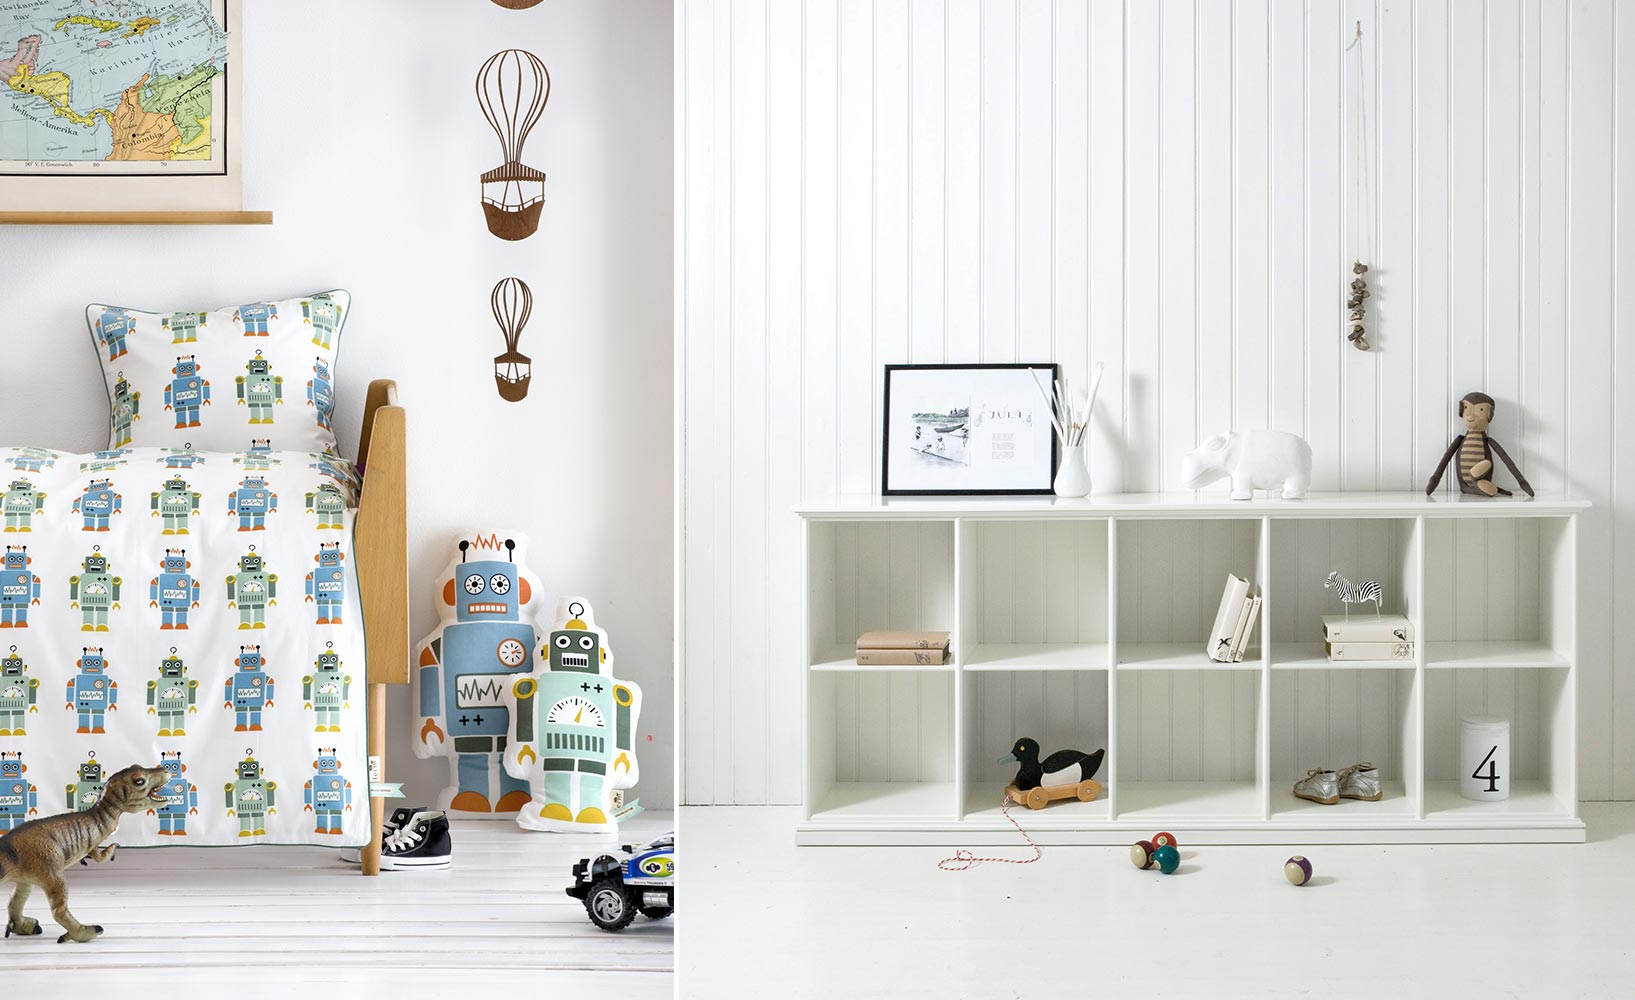 Full Size of Kinderzimmer Kindgerecht Einrichten Regale Regal Weiß Sofa Kinderzimmer Einrichtung Kinderzimmer